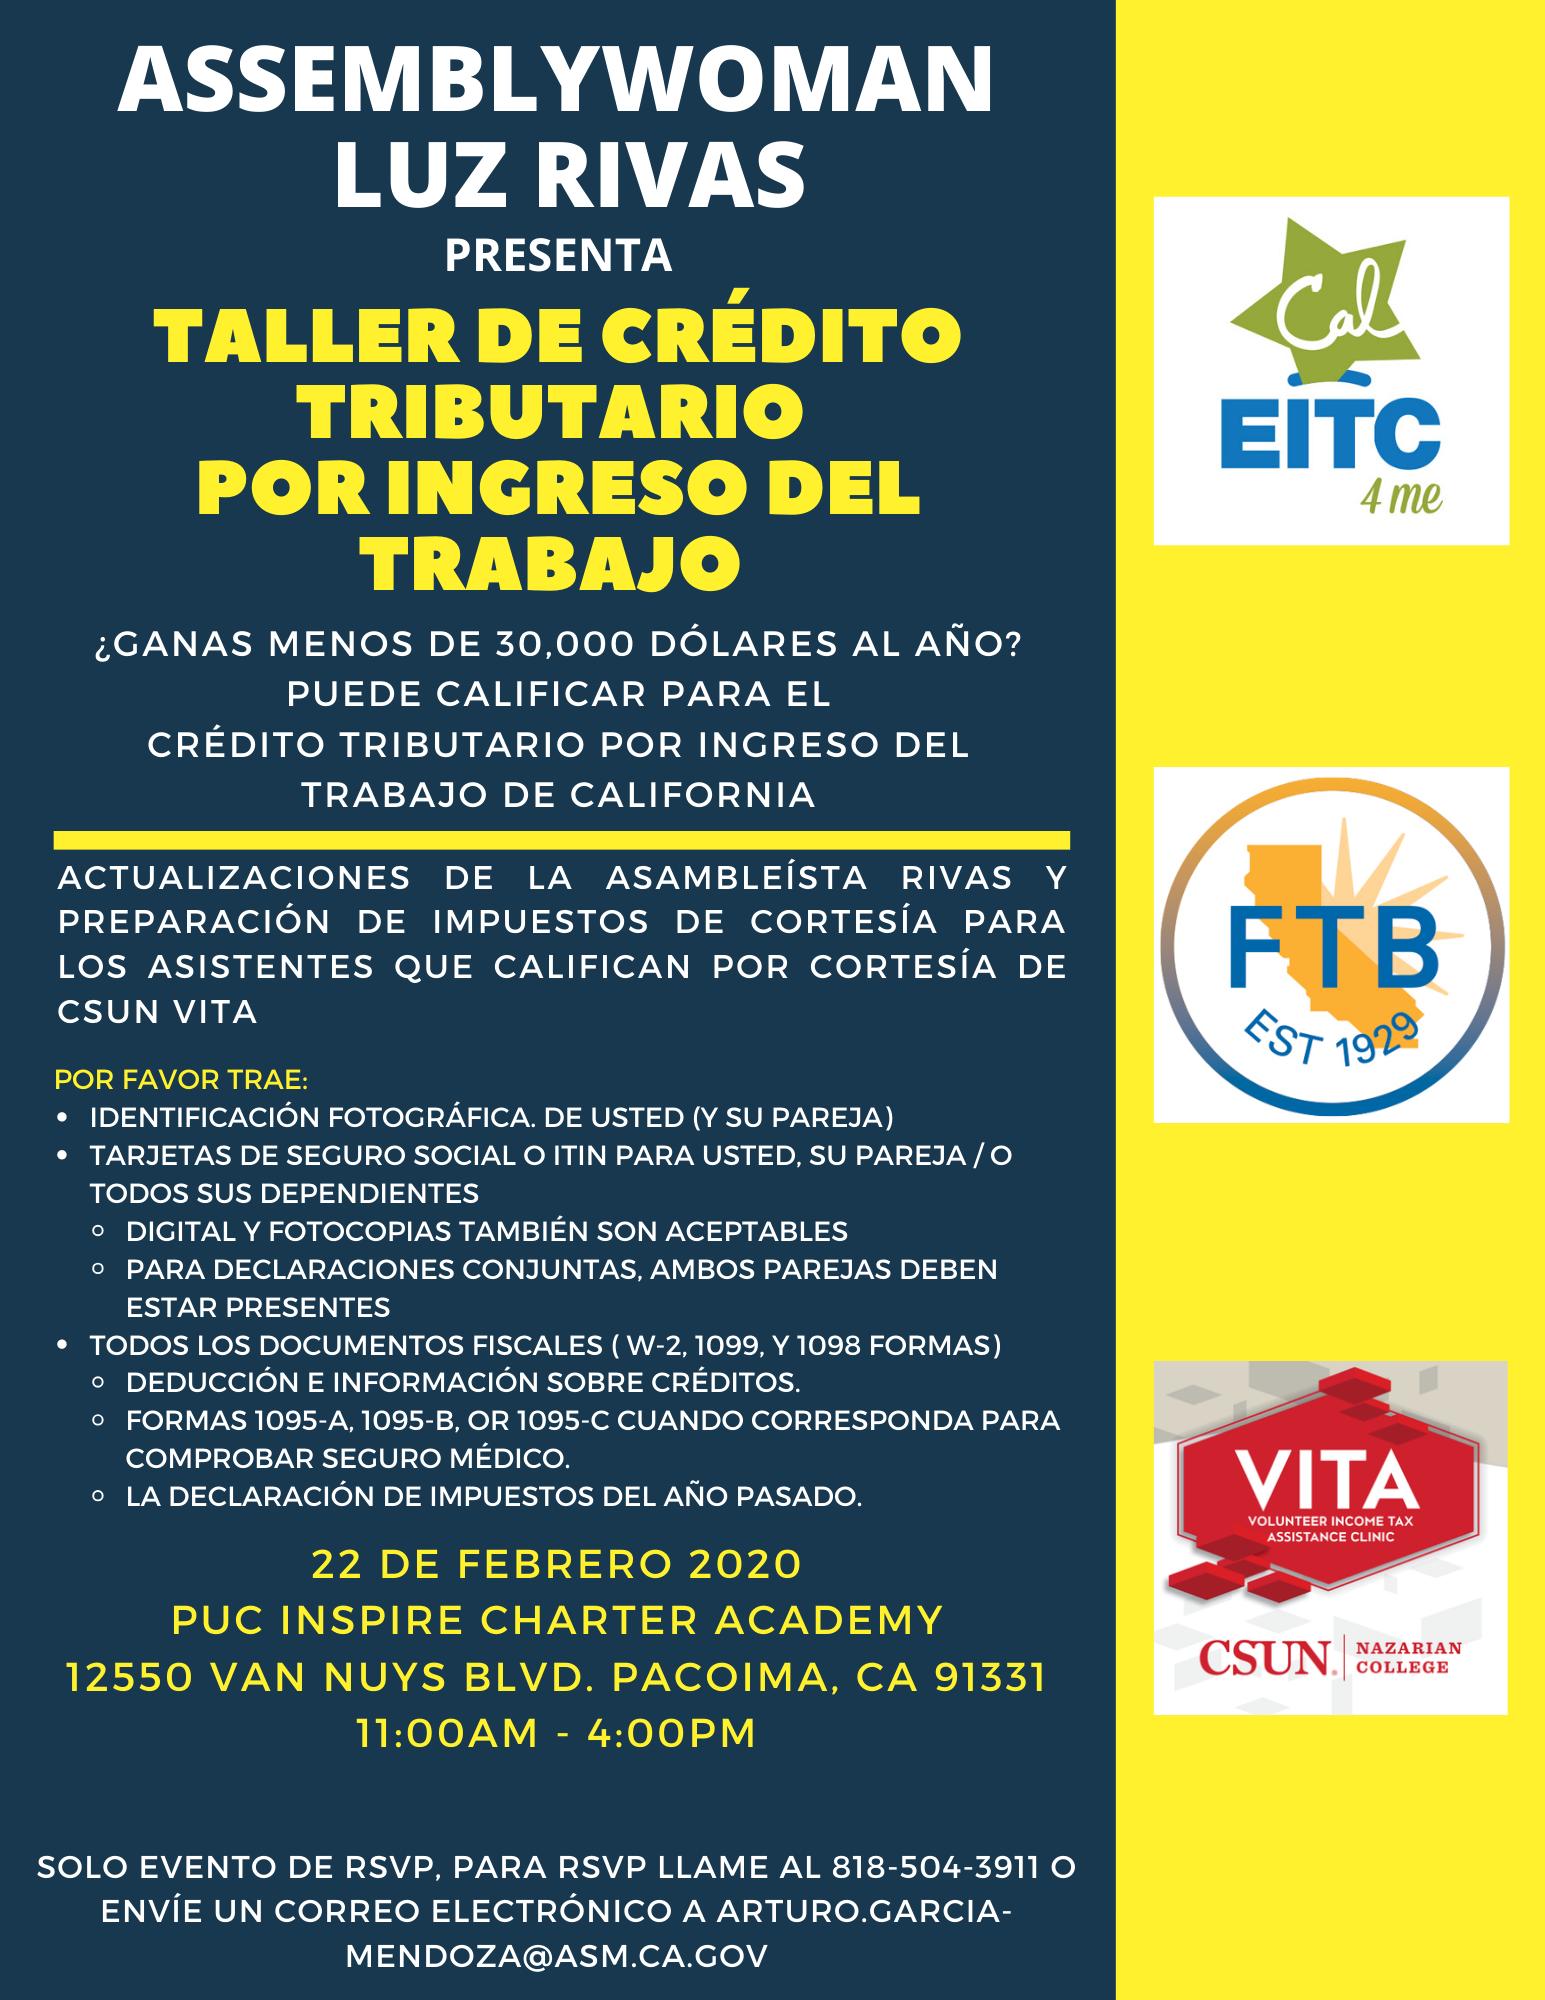 taller de credito tributario